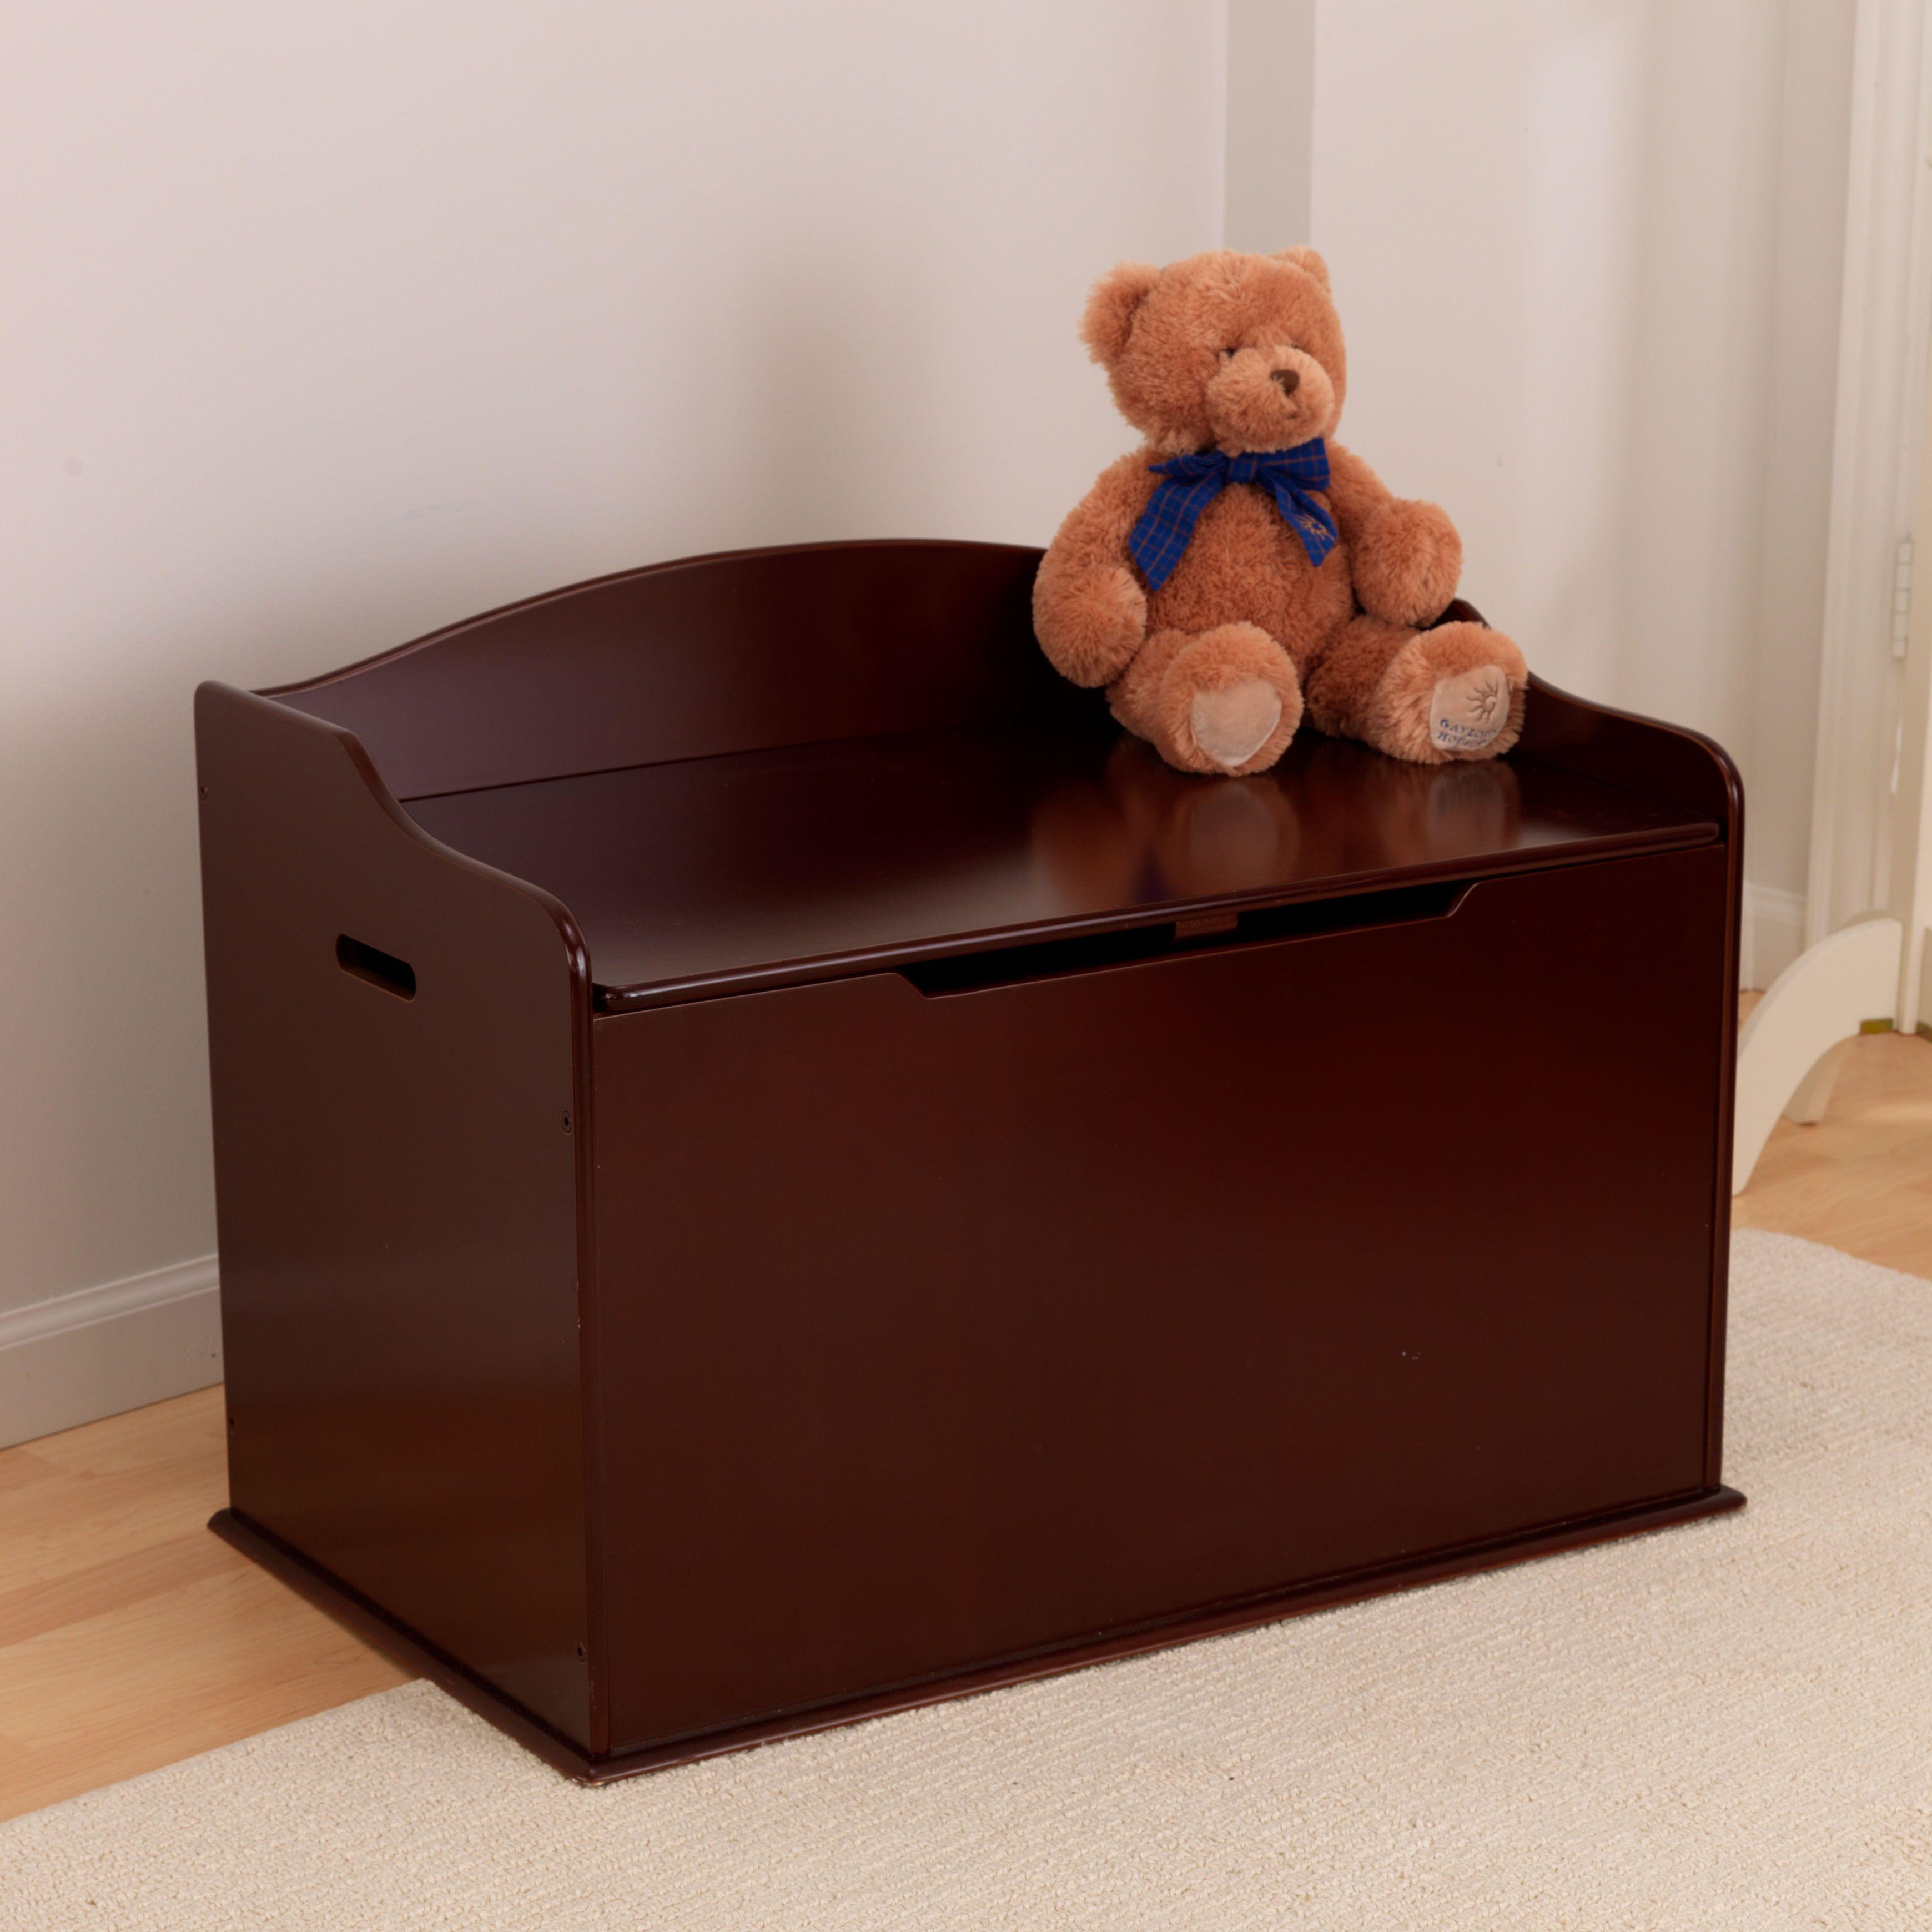 Austin Toy Box Cherry Wooden Toy Boxes Toy Storage Boxes Wood Toy Box